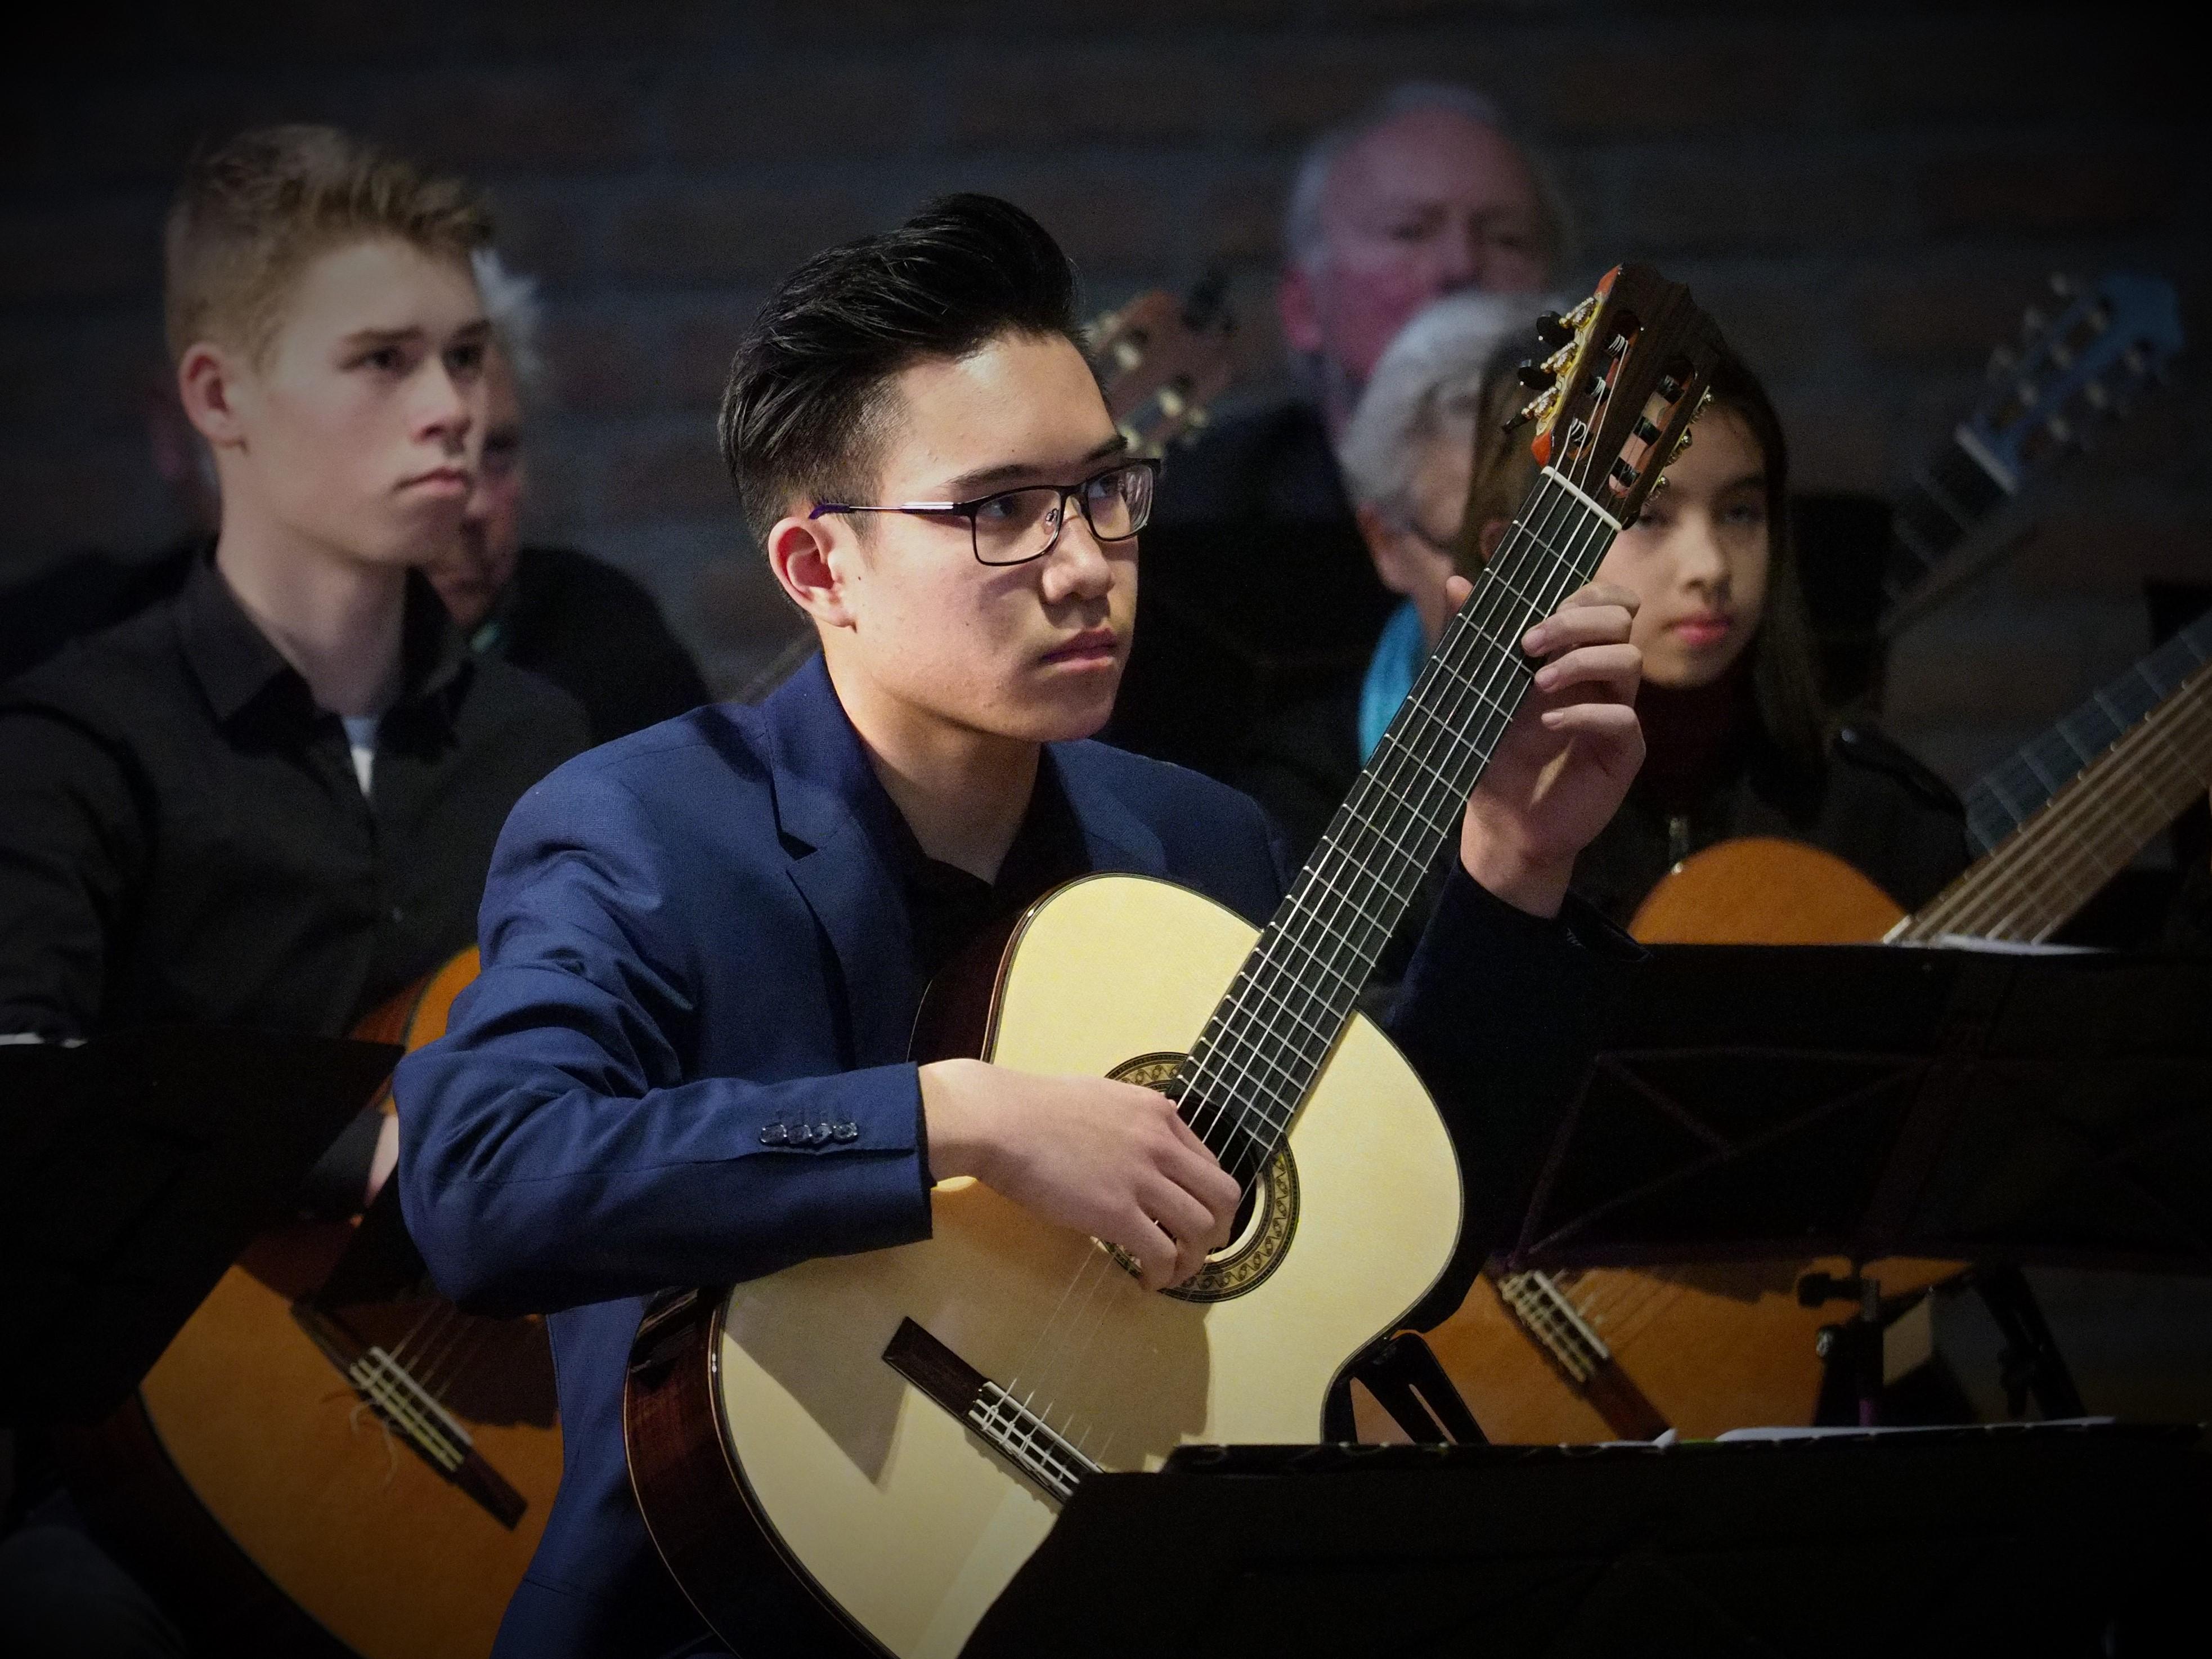 Isaac speelt Vivaldi Concerto in D